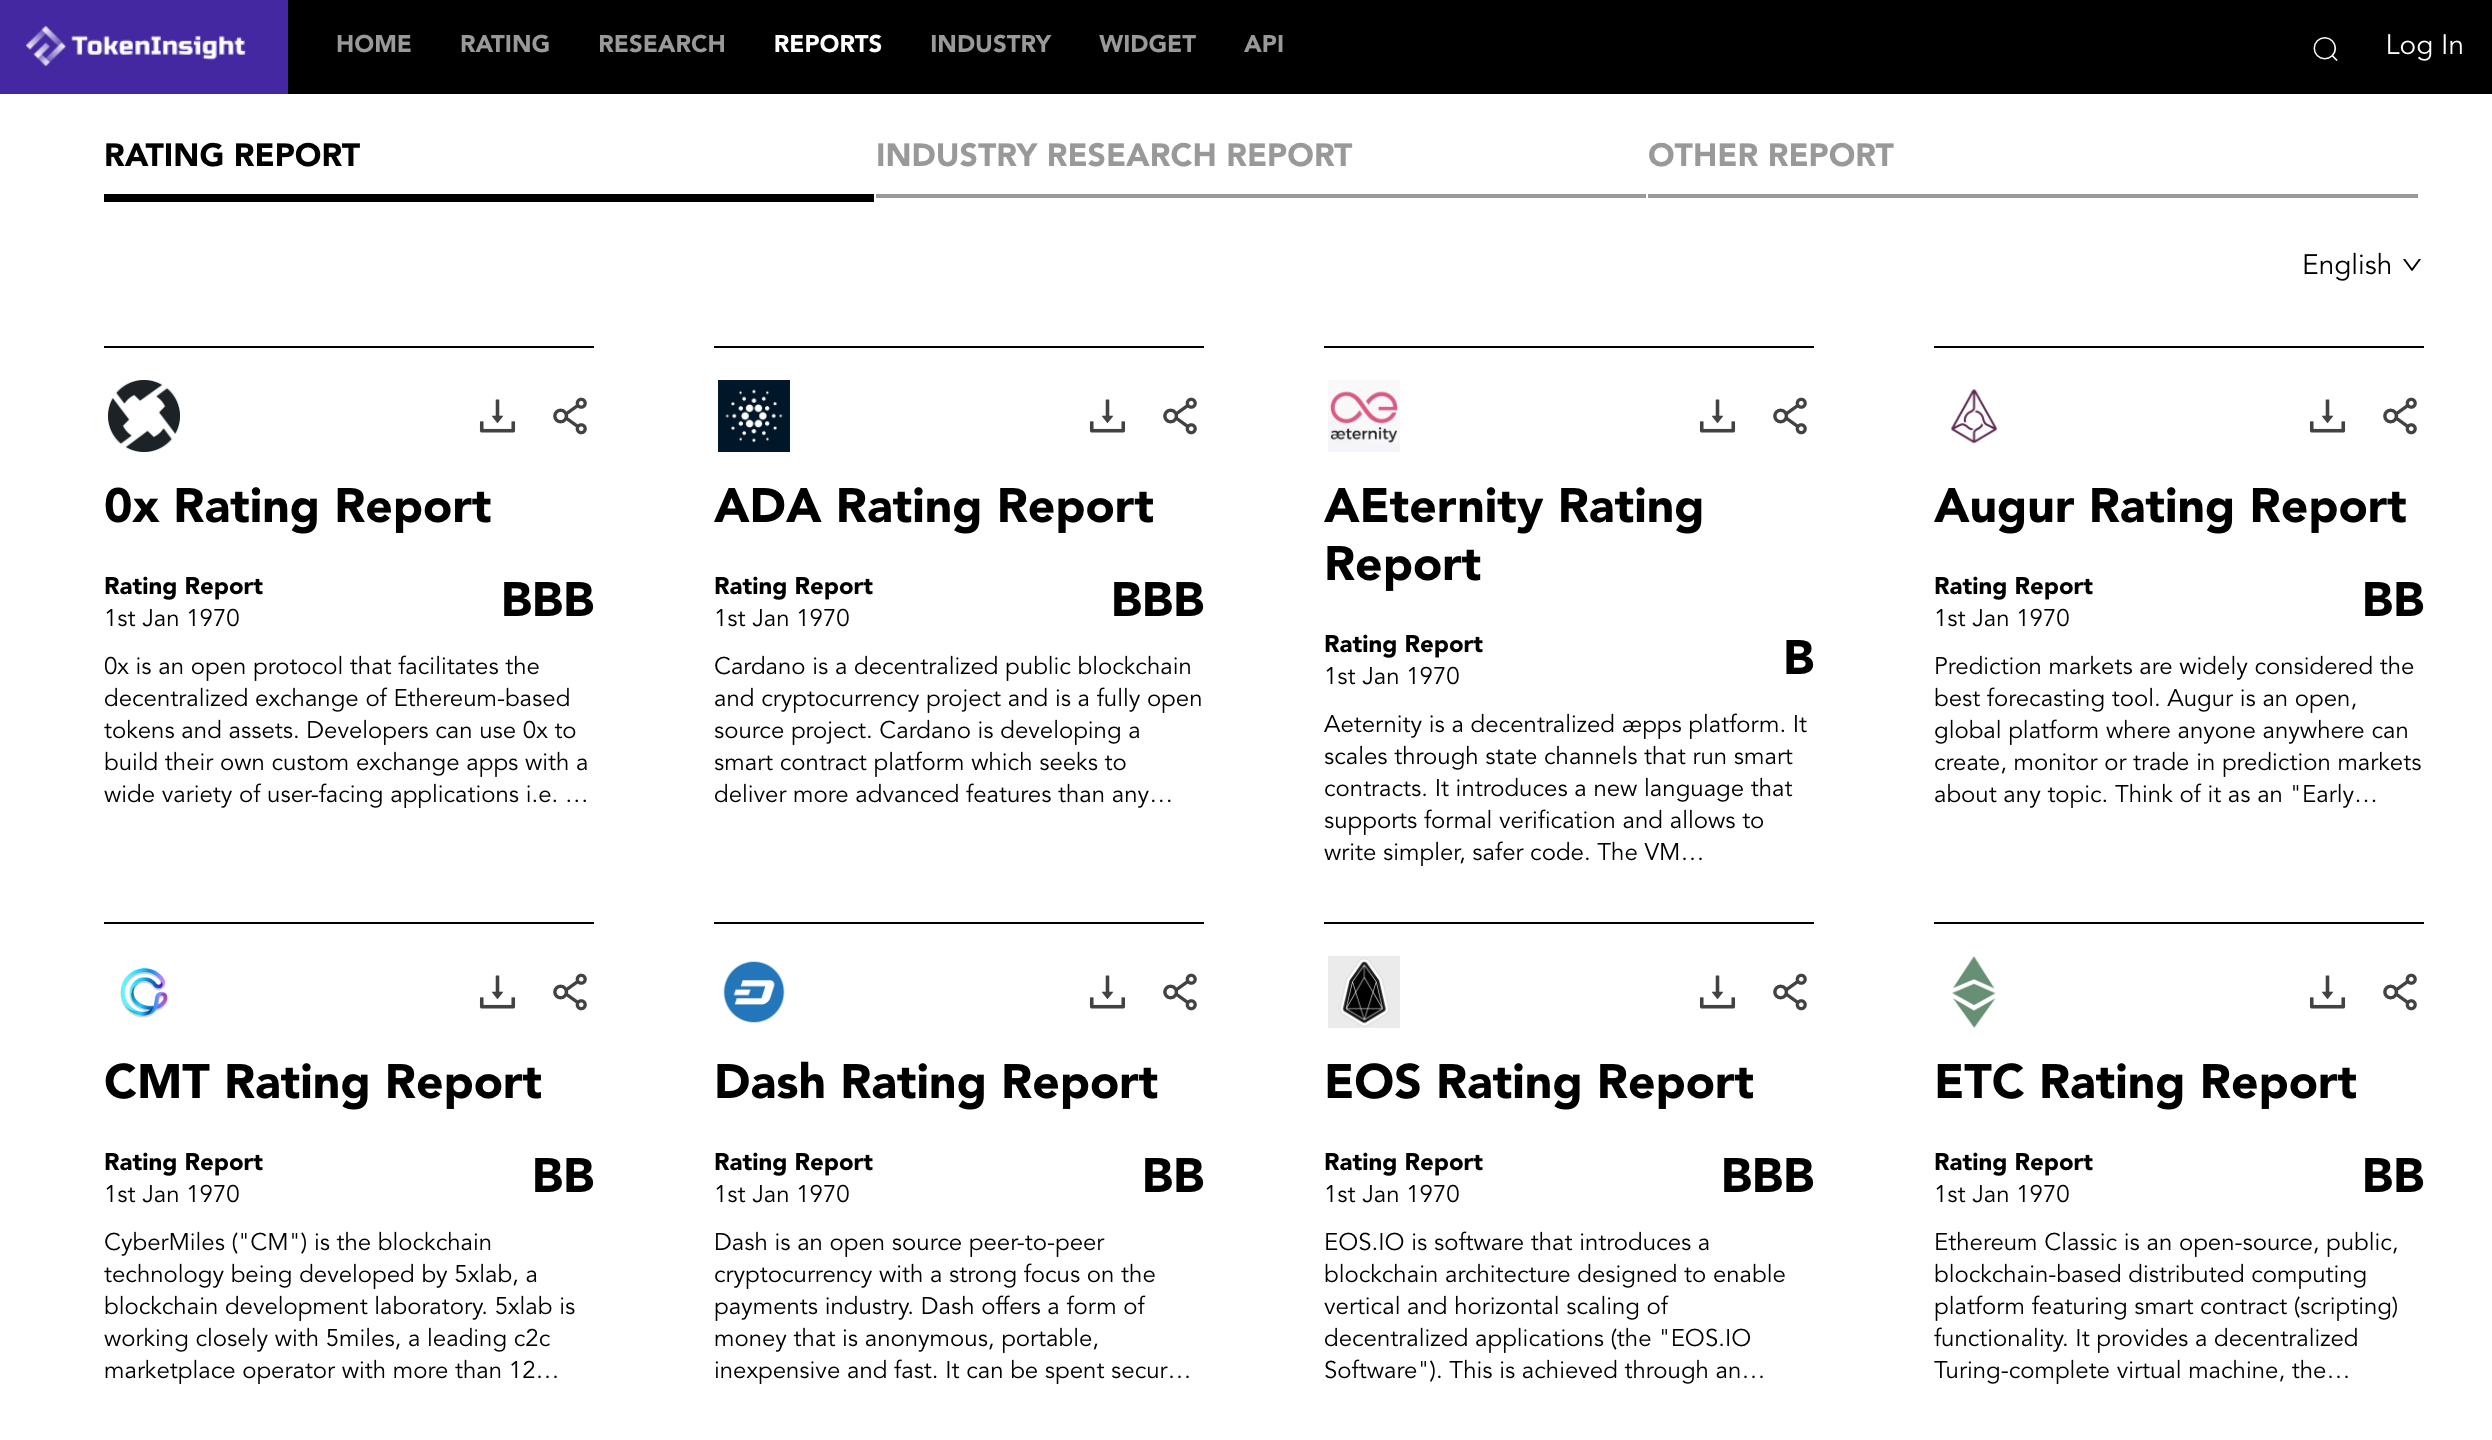 5评级报告.png